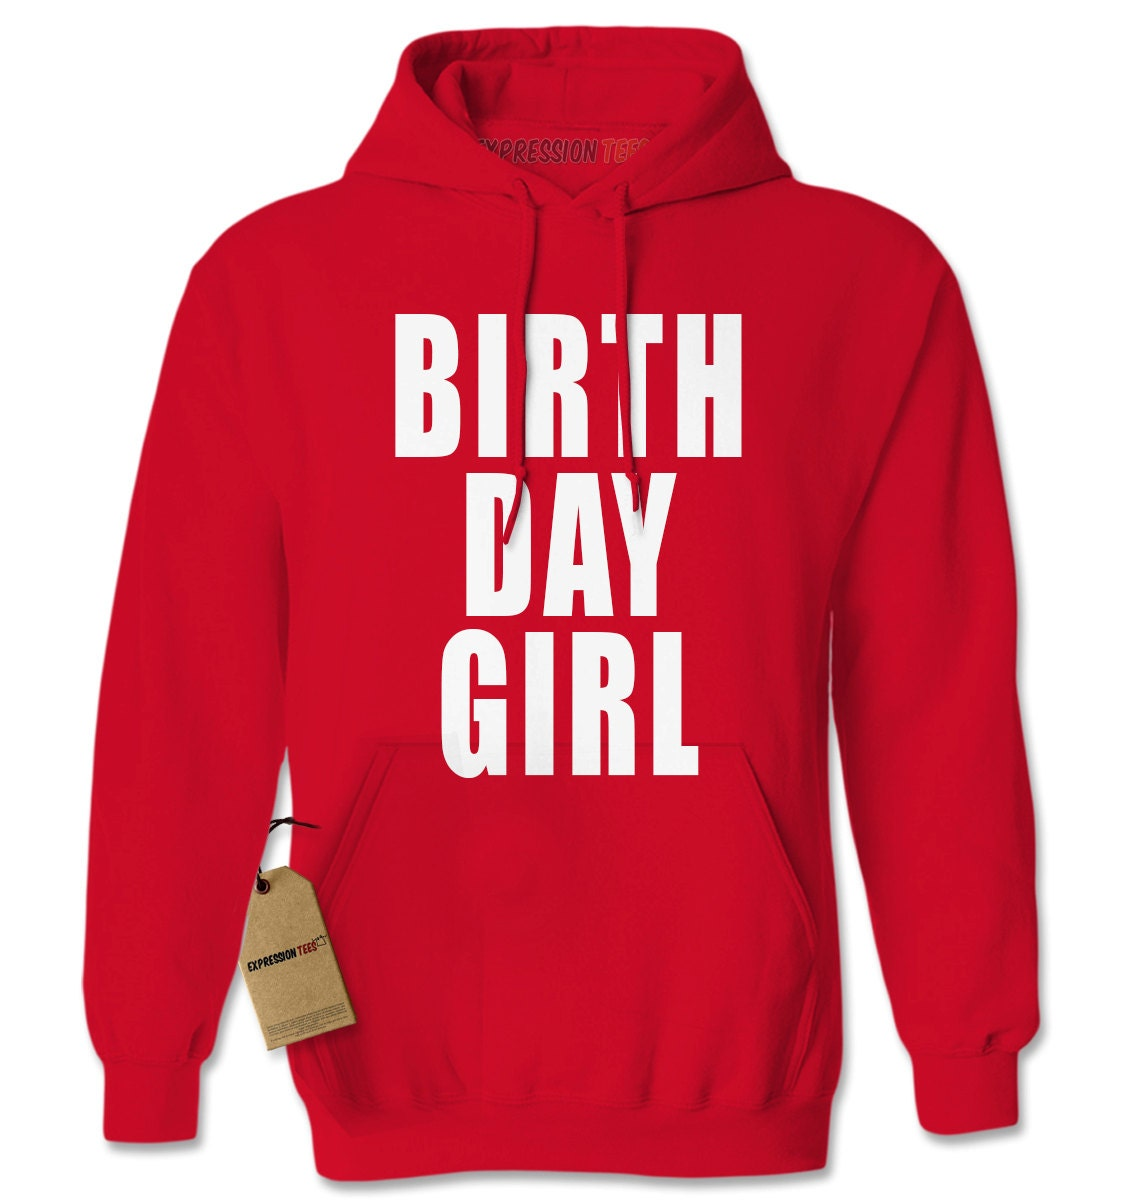 Hoodie Birthday Girl Hooded Jacket Sweatshirt Birthday Party